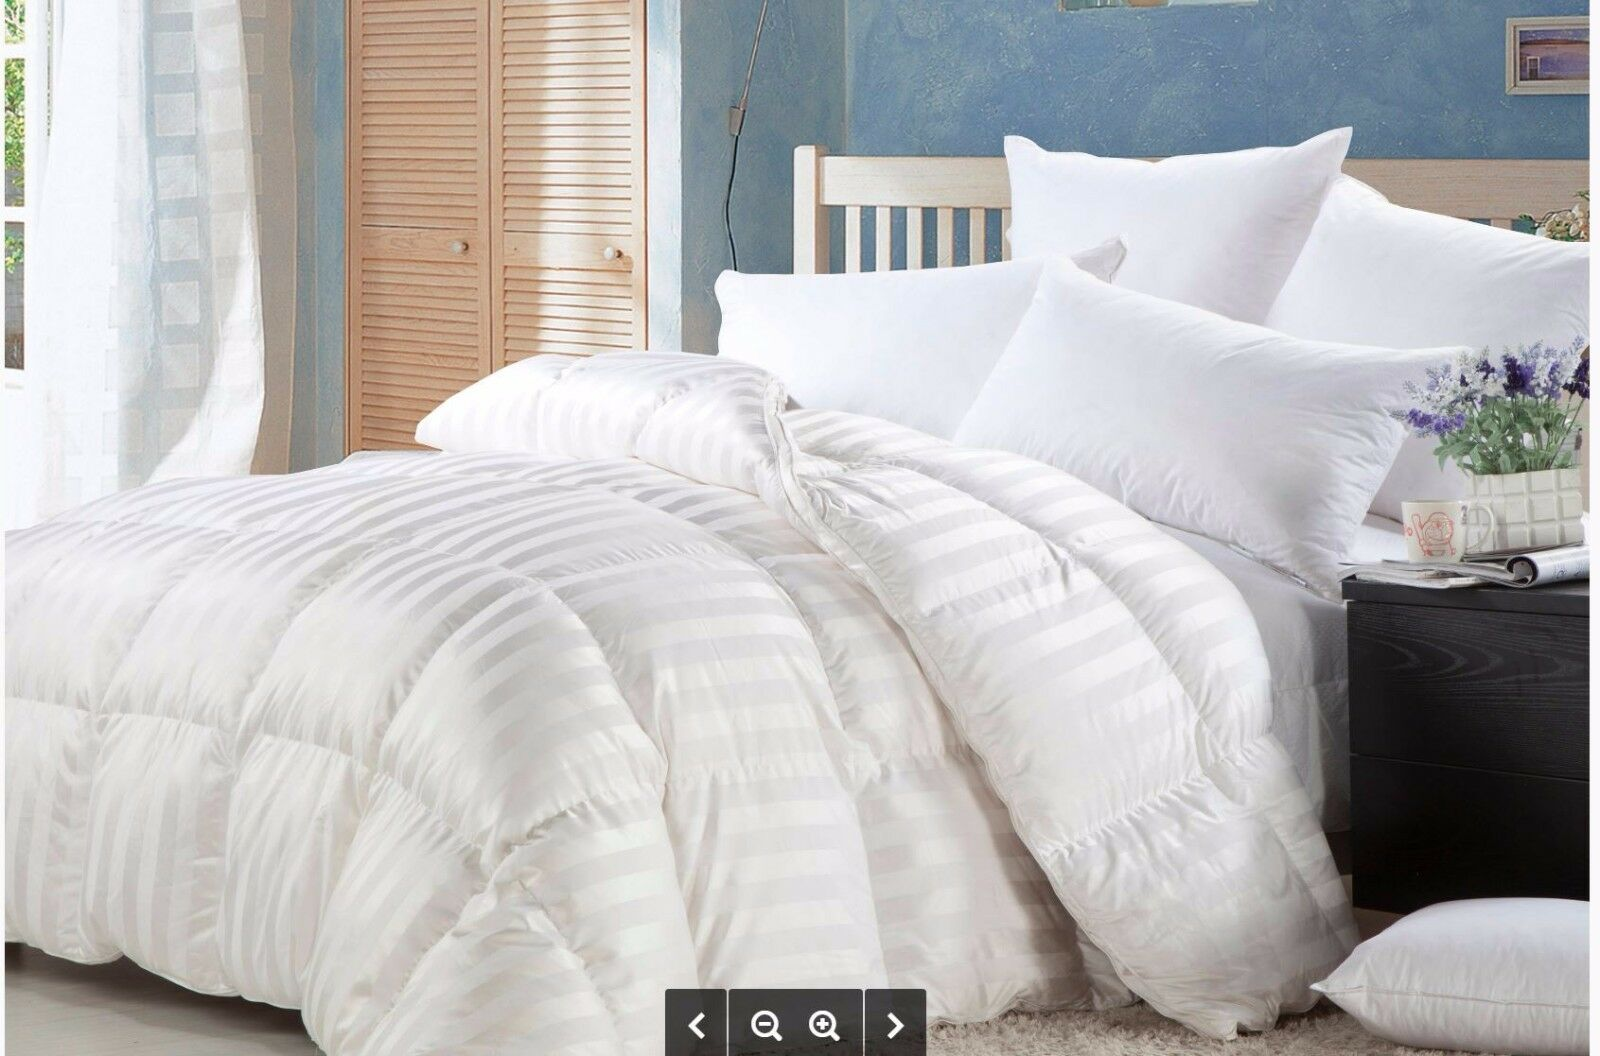 twin down comforter luxurious baffle box siberian goose down stripe comforter 1200tc twin queen king